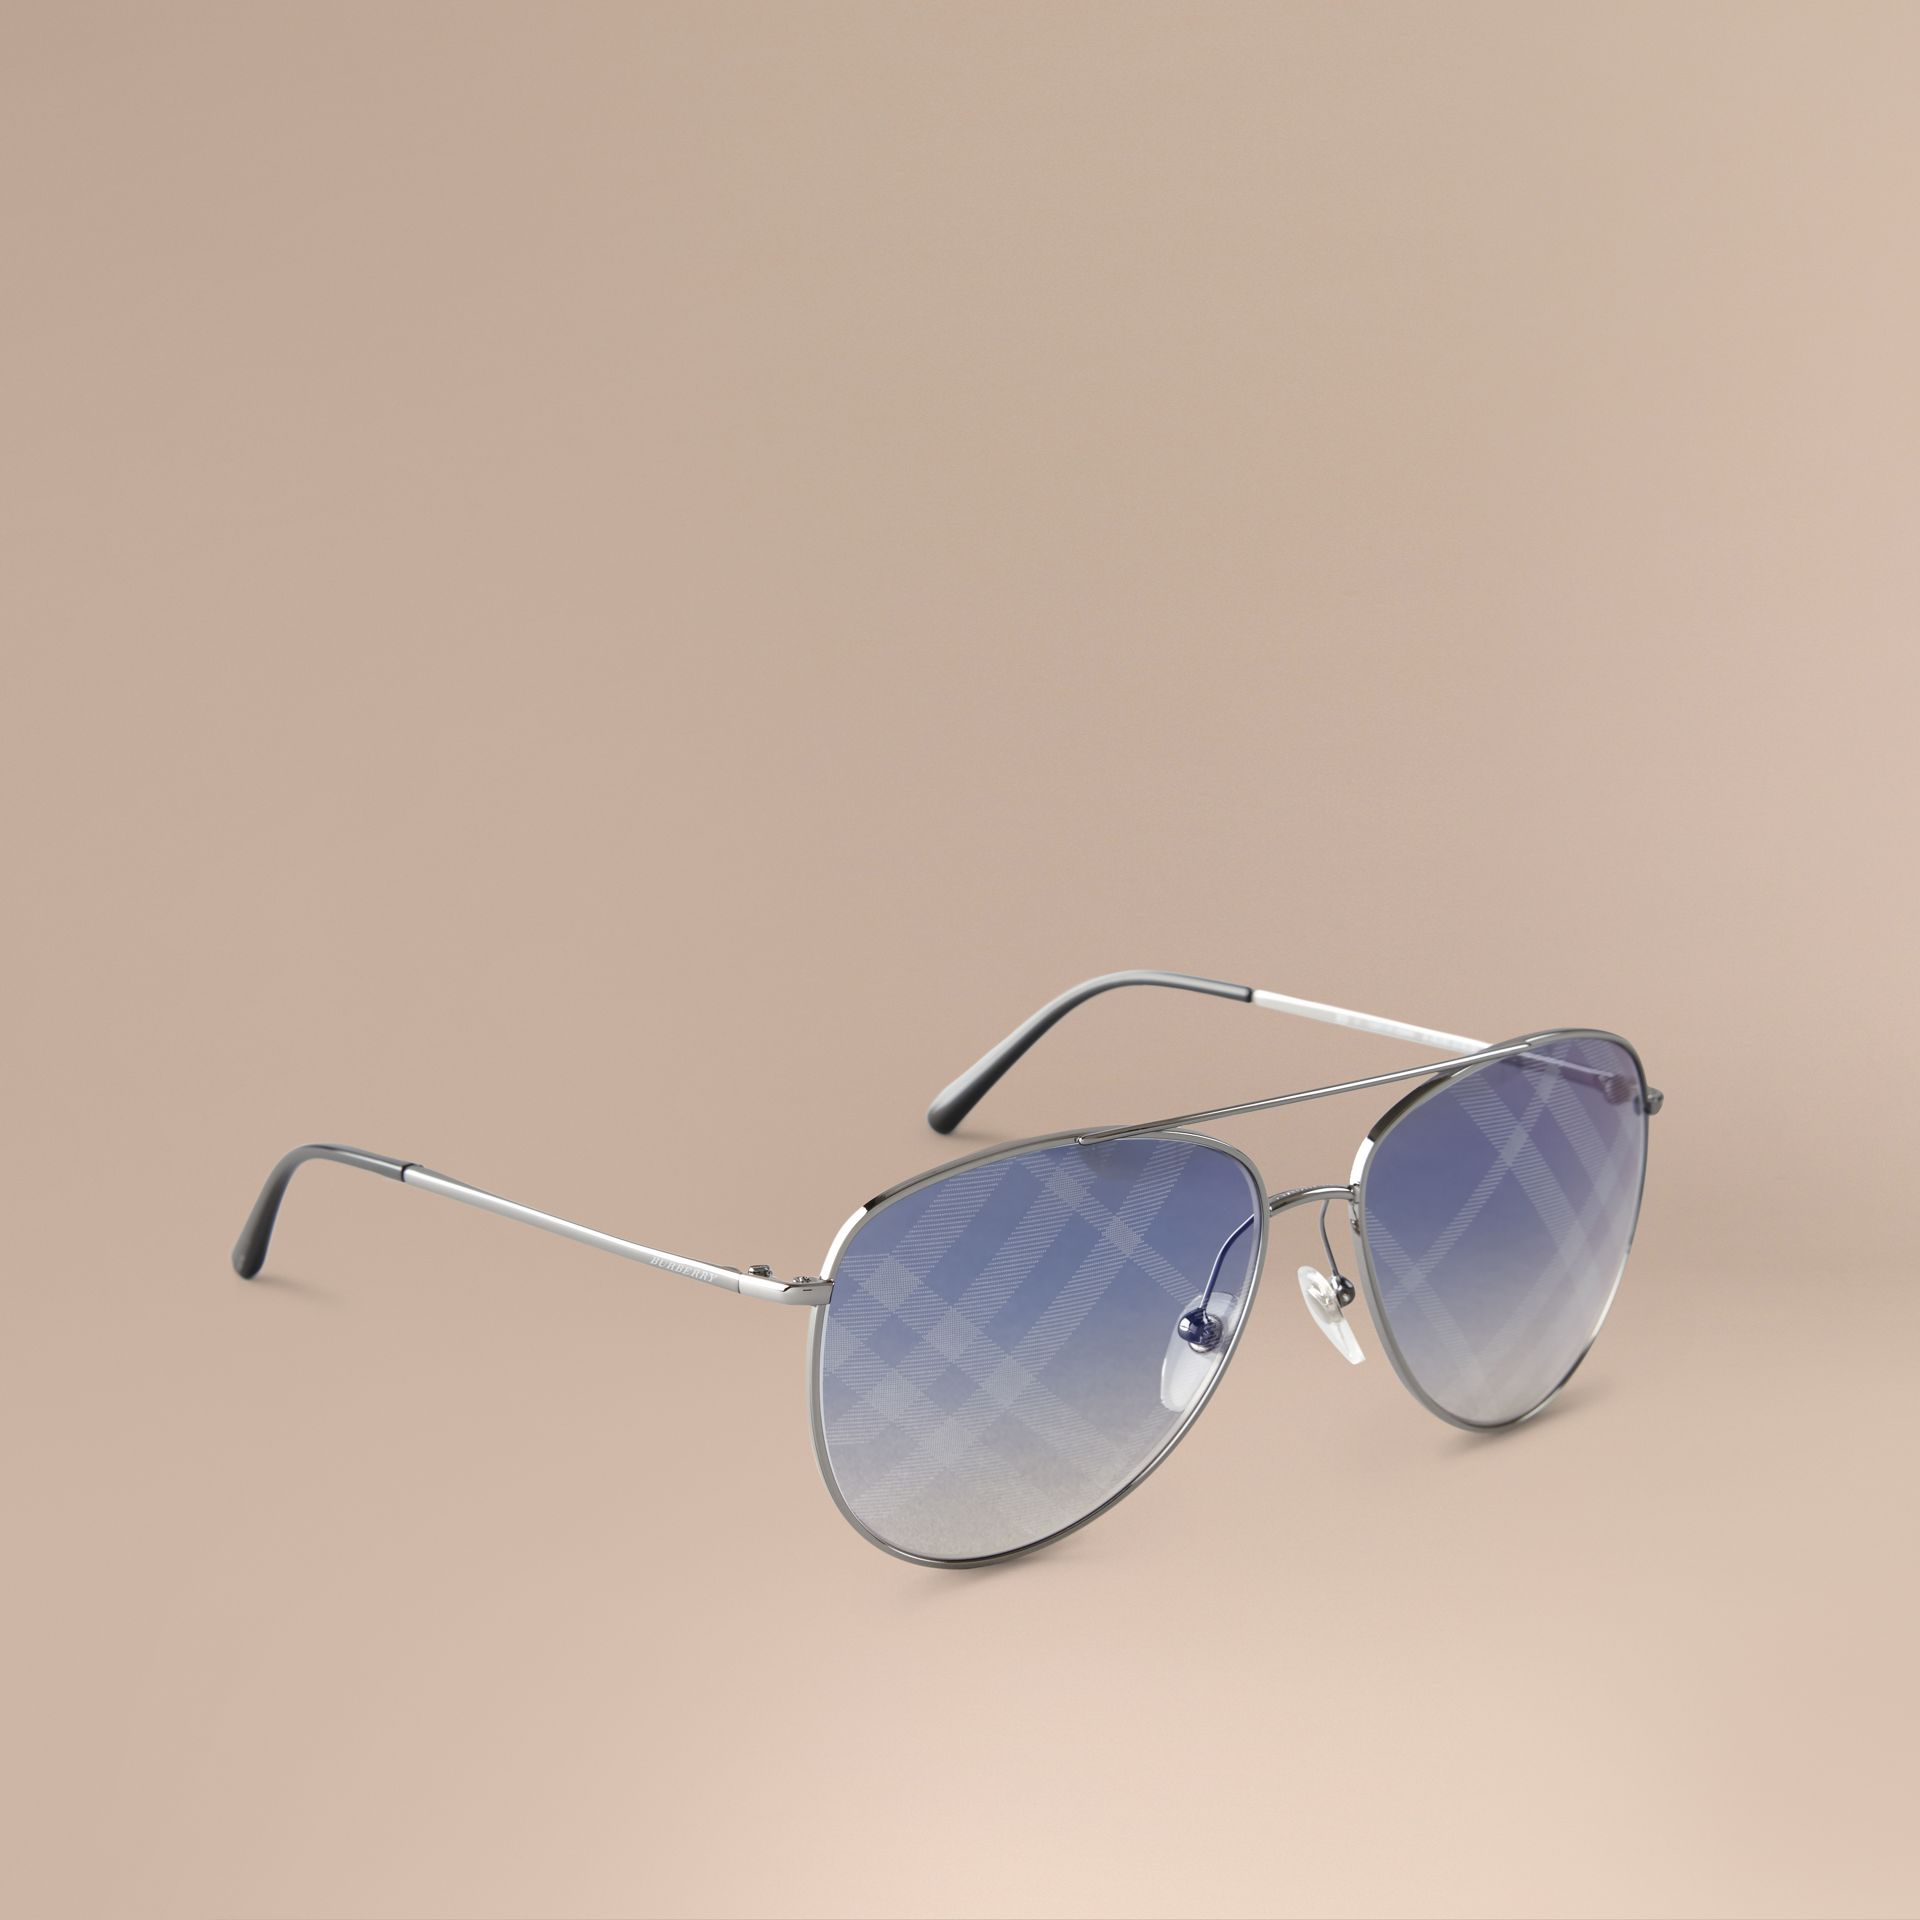 Check Lens Aviator Sunglasses - gallery image 1